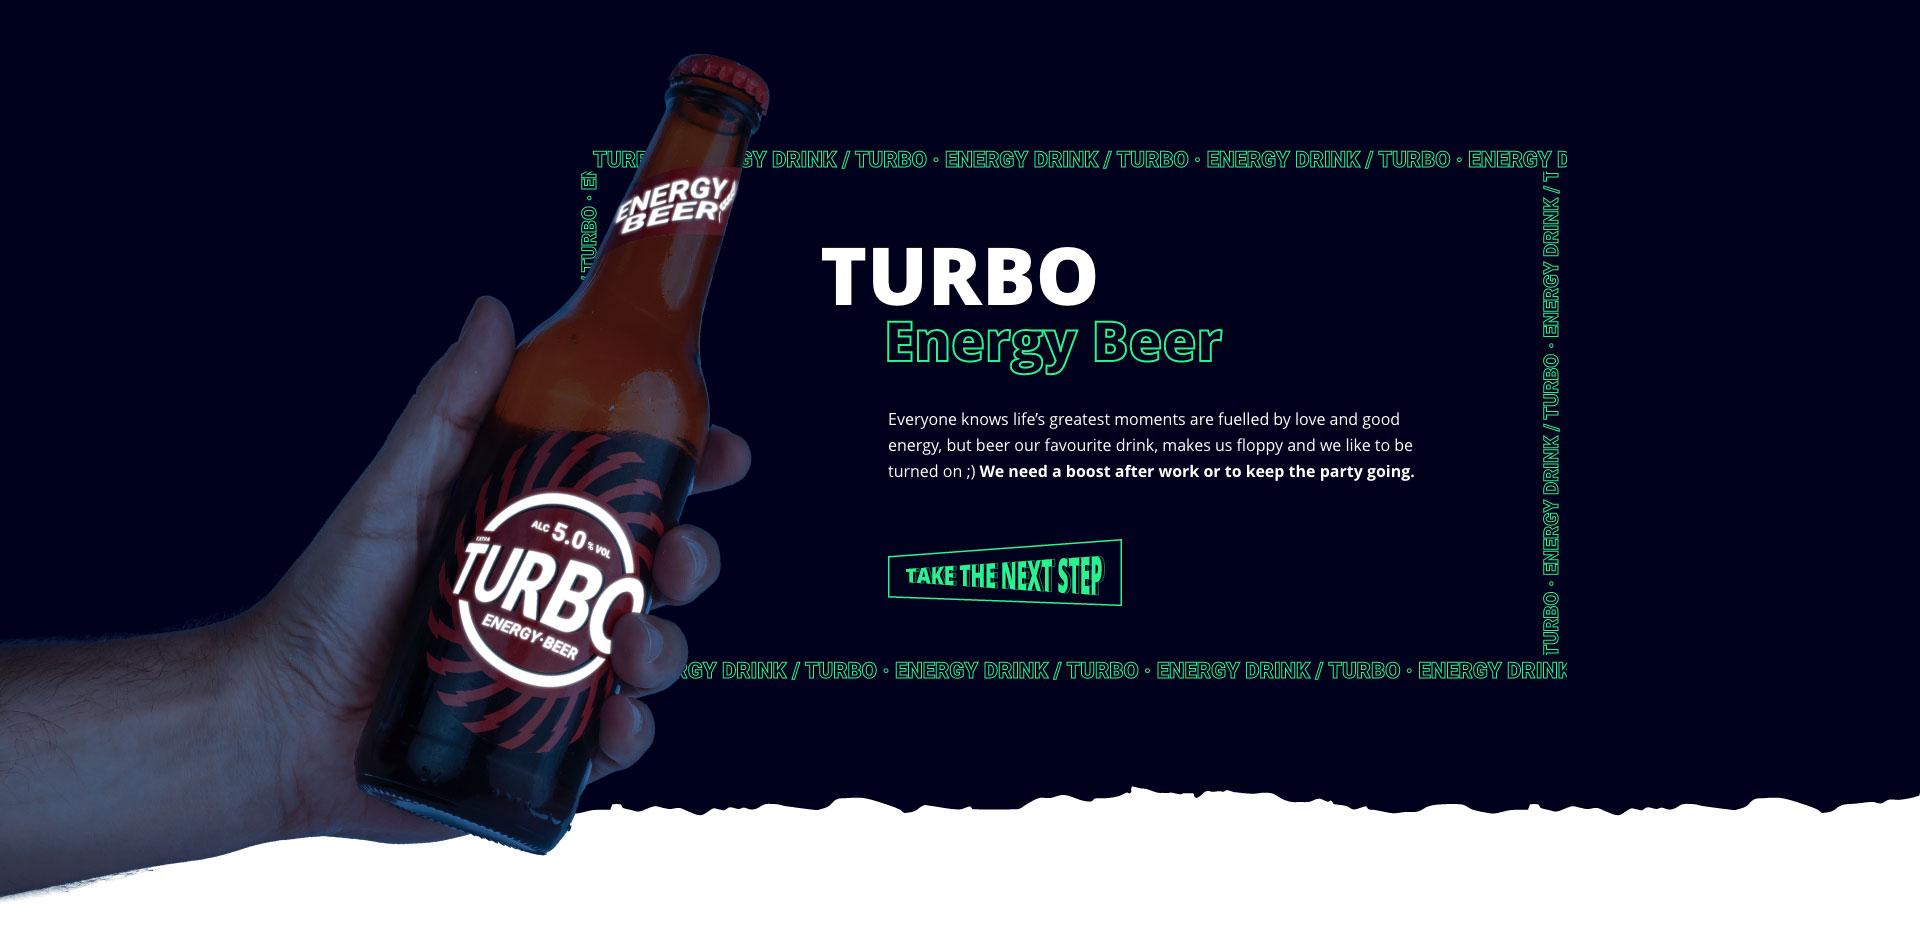 Imagen Turbo Energy Beer img-total